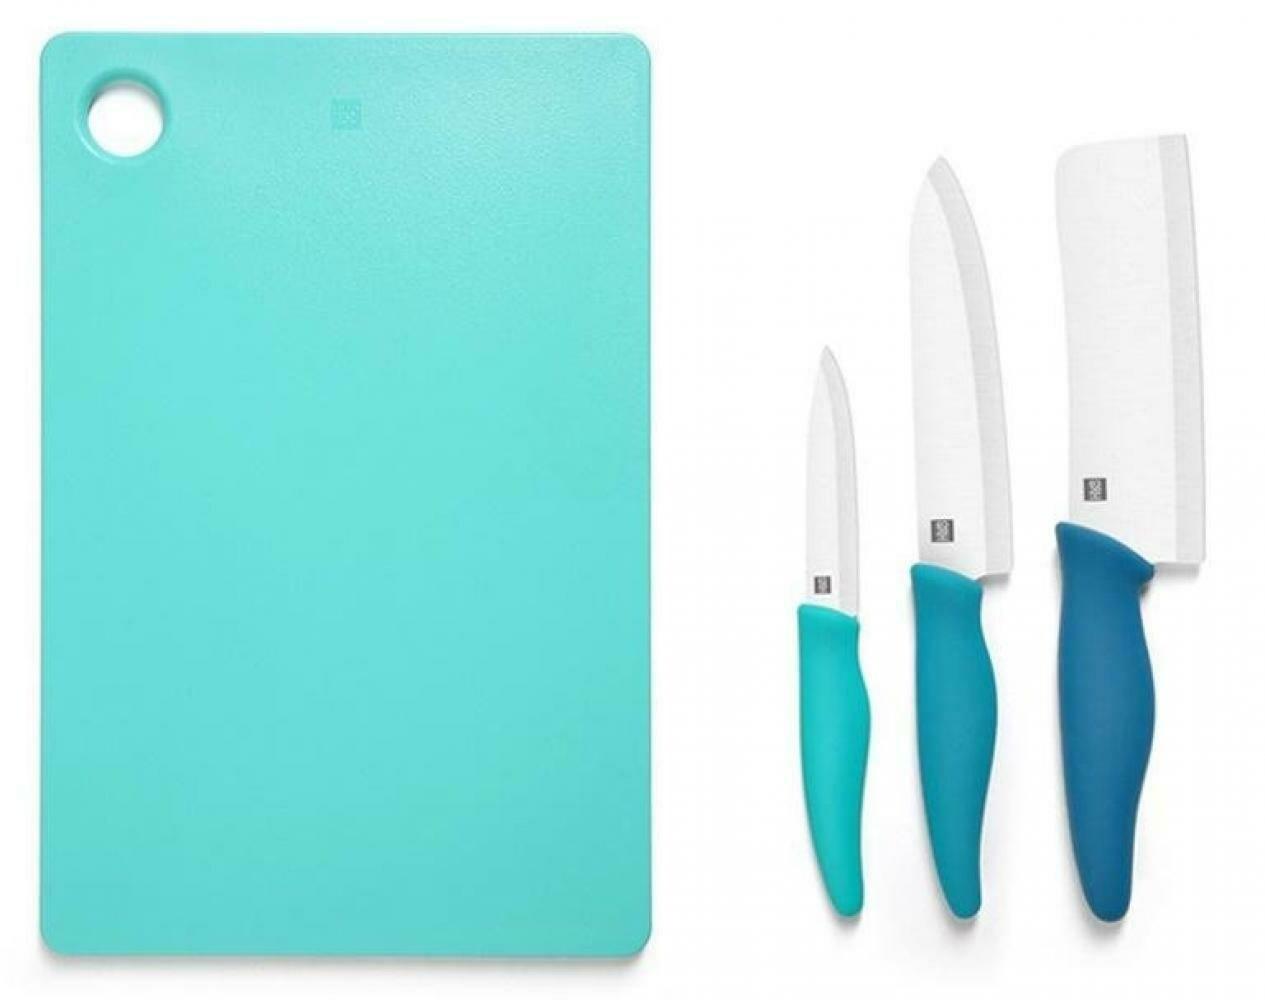 Набор Xiaomi Hot ceramic HU0020, 3 ножа и доска, голубой